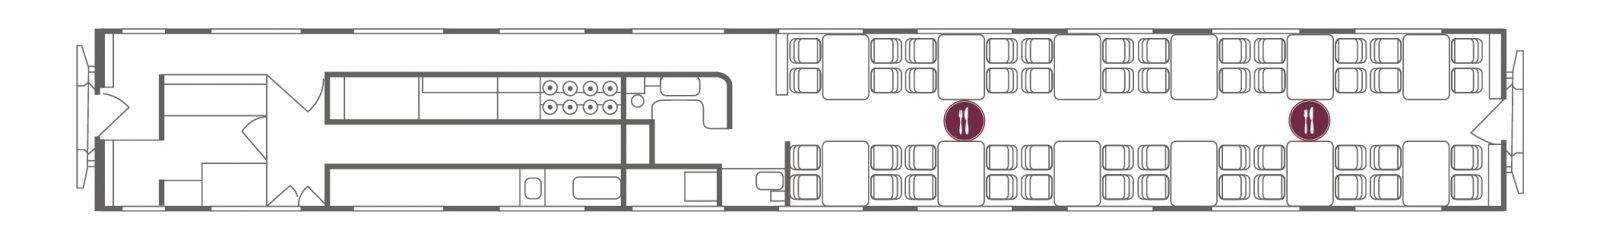 Compartments-03